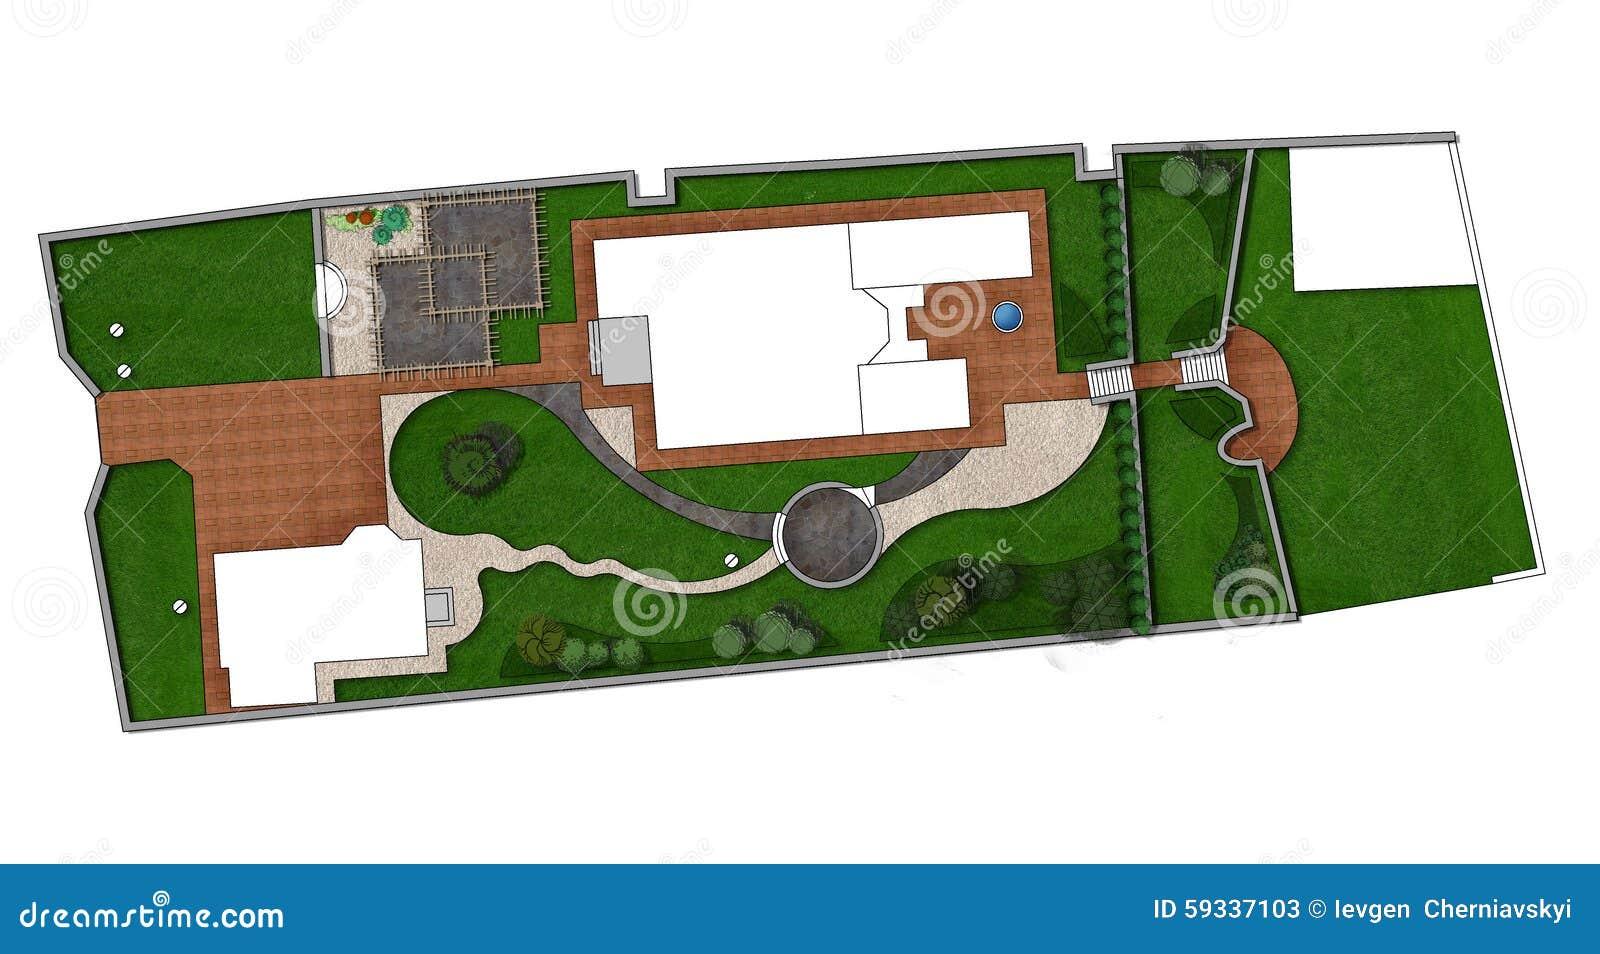 Landscaping Master Plan 2d Sketch Stock Illustration